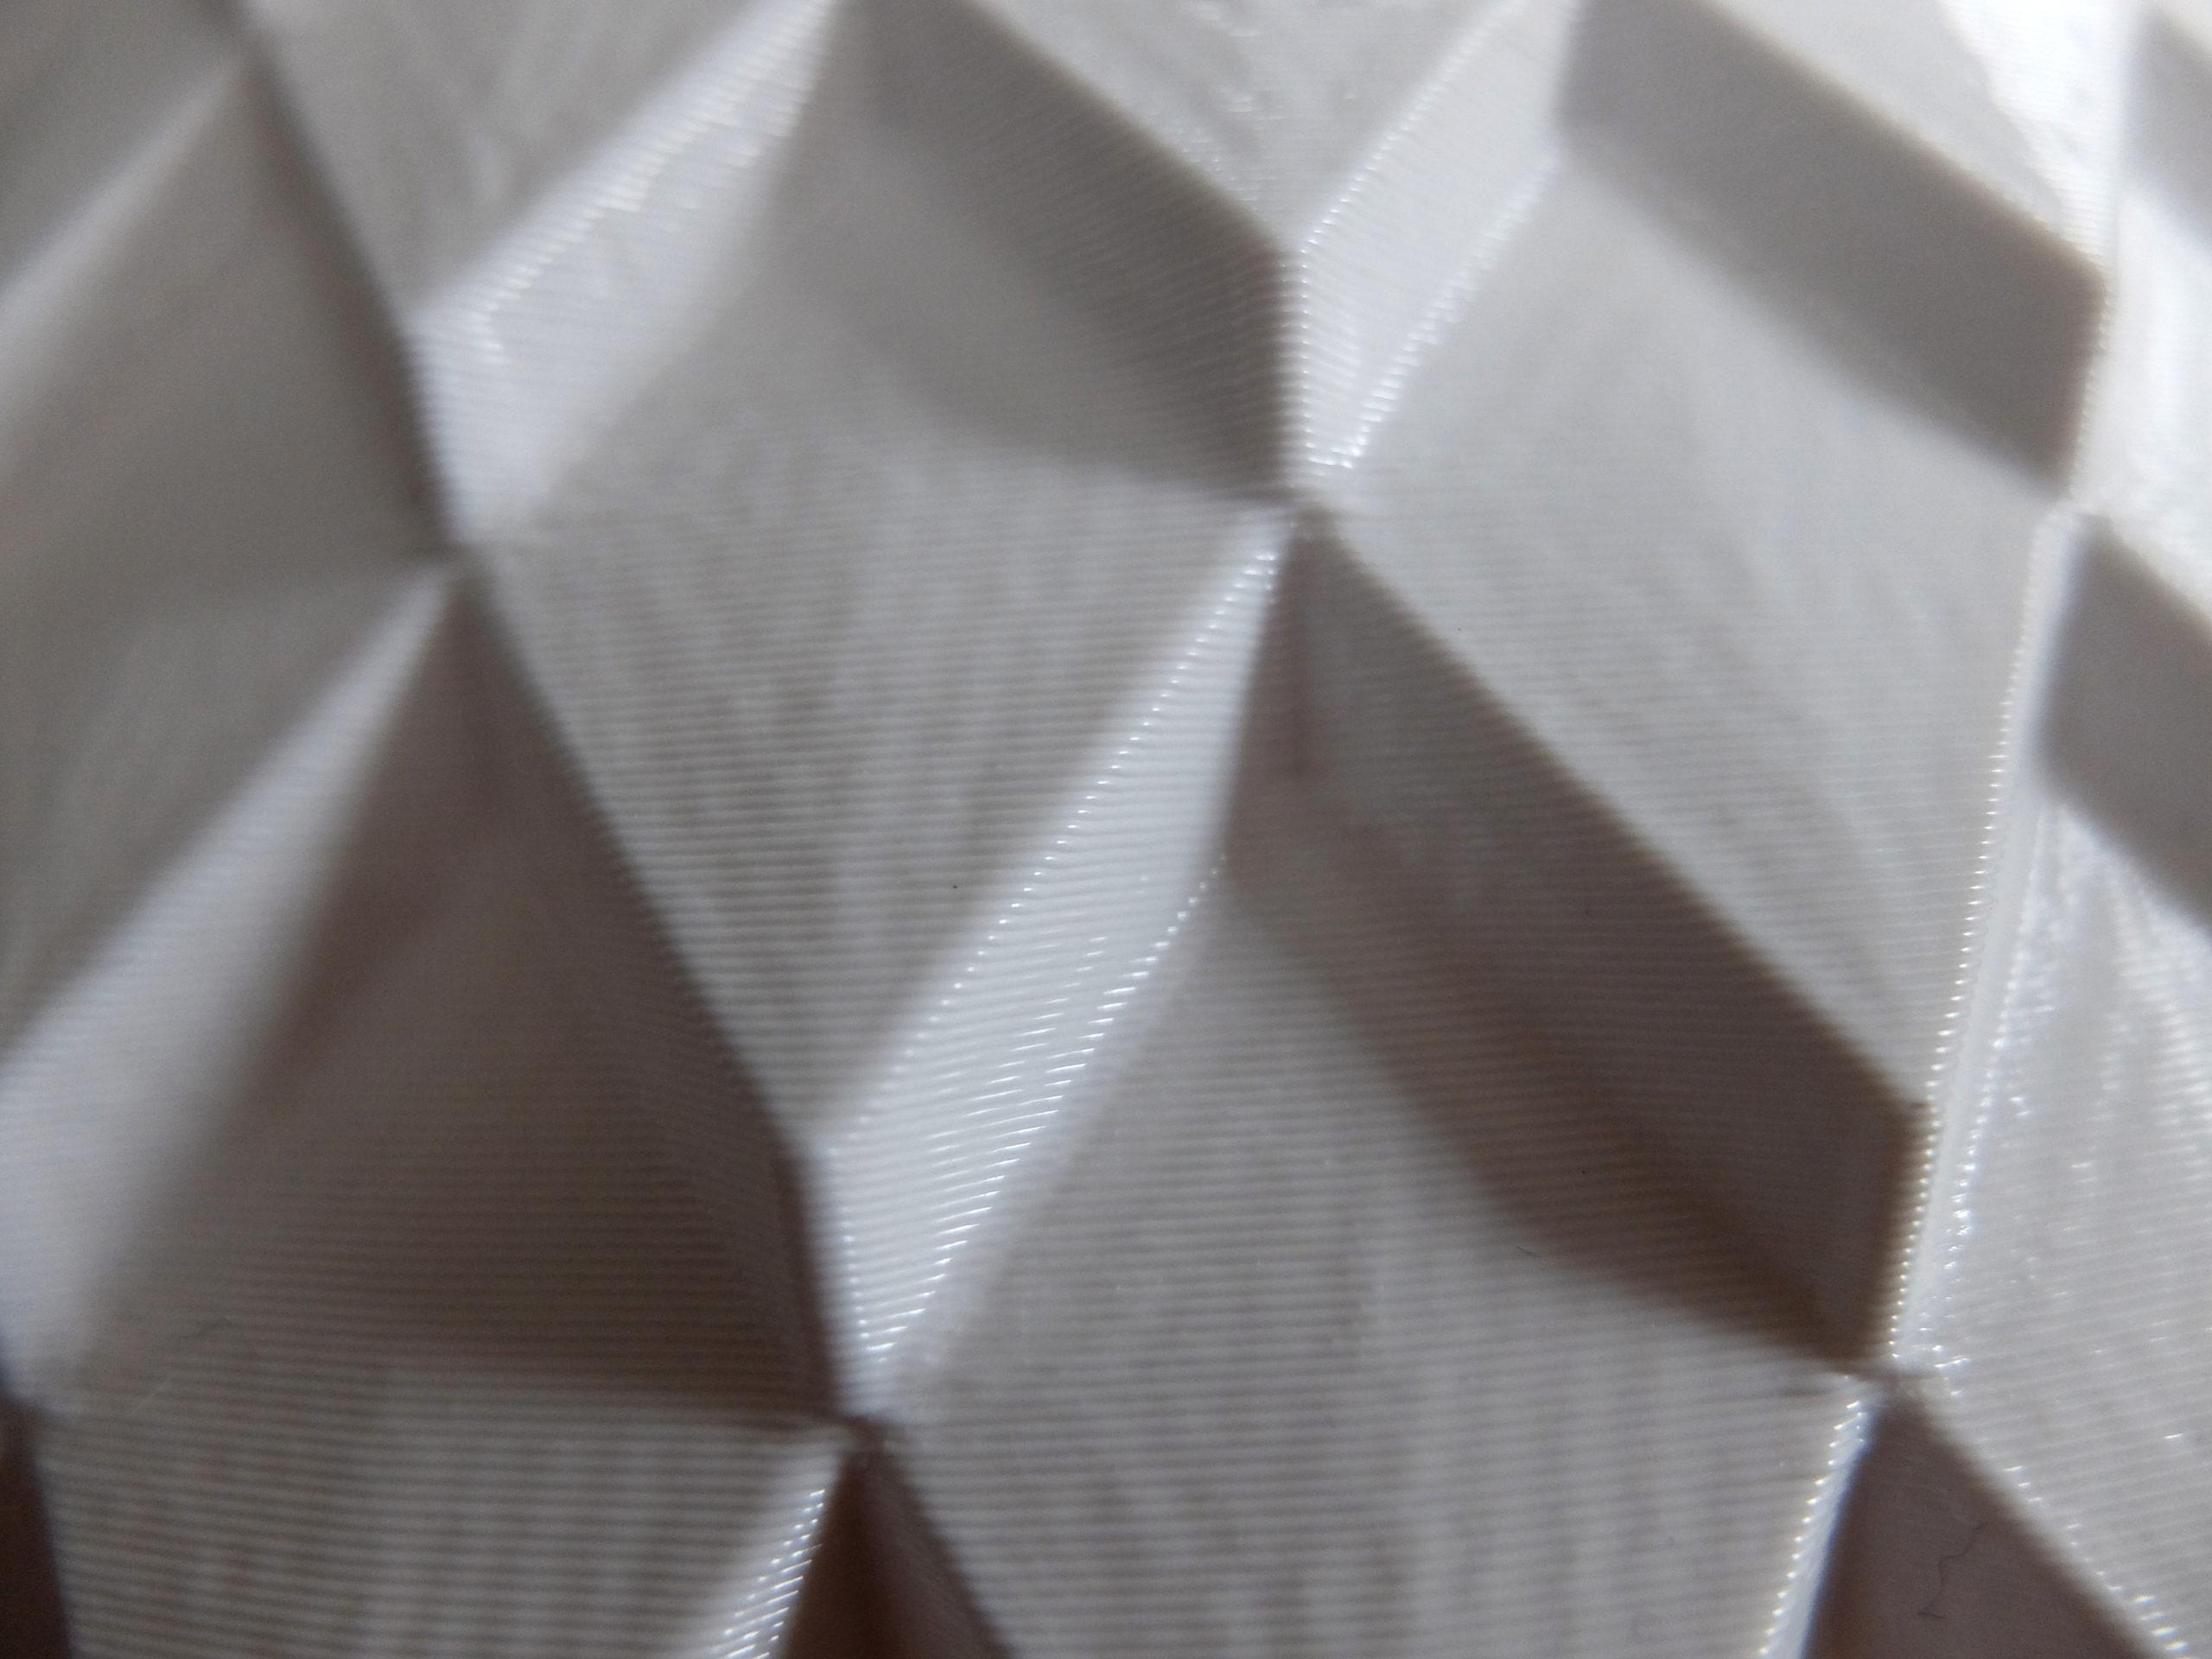 Close-up photo of 3d printed parametric vase design